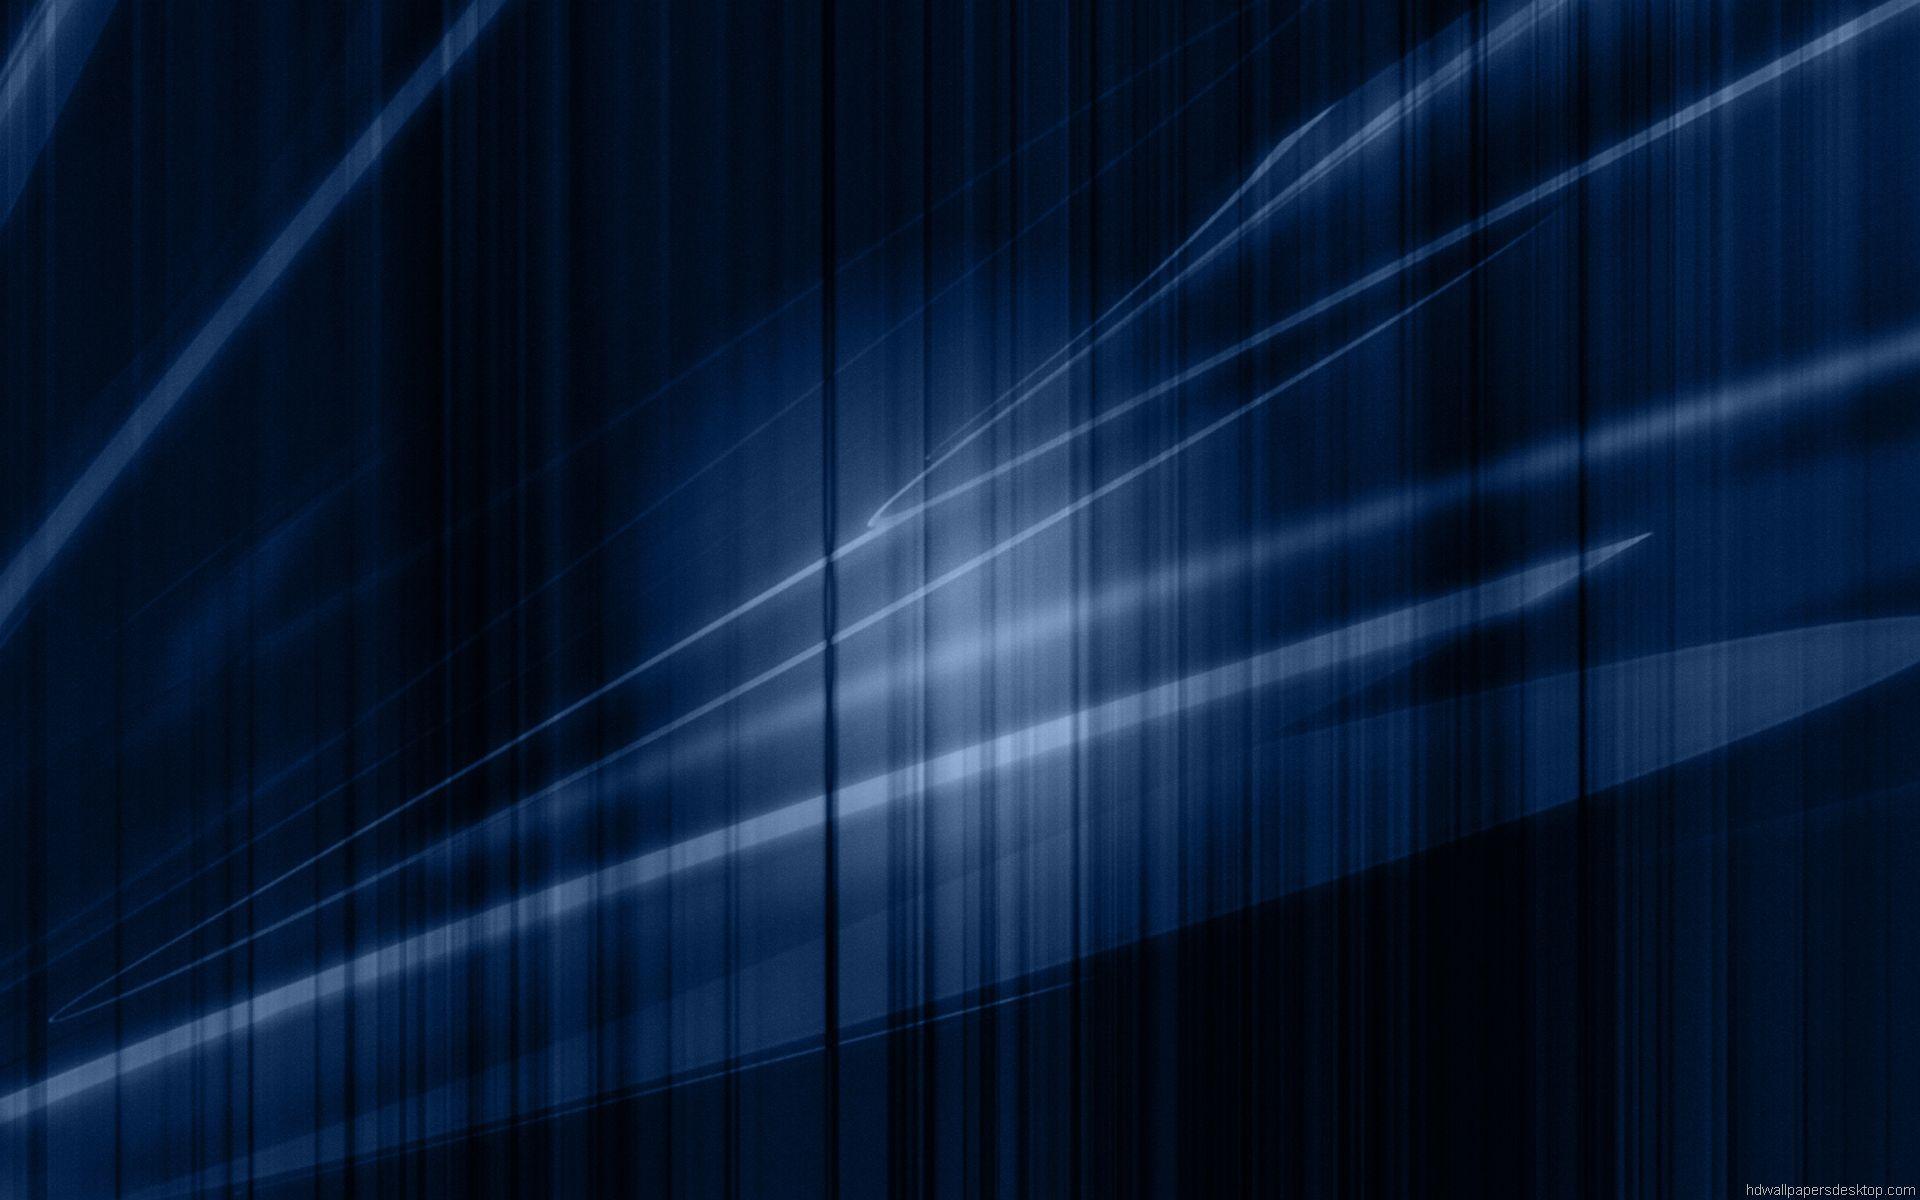 windows hd wallpapers p wallpaper hd wallpapers pinterest wallpaper hd wallpaper and desktop backgrounds